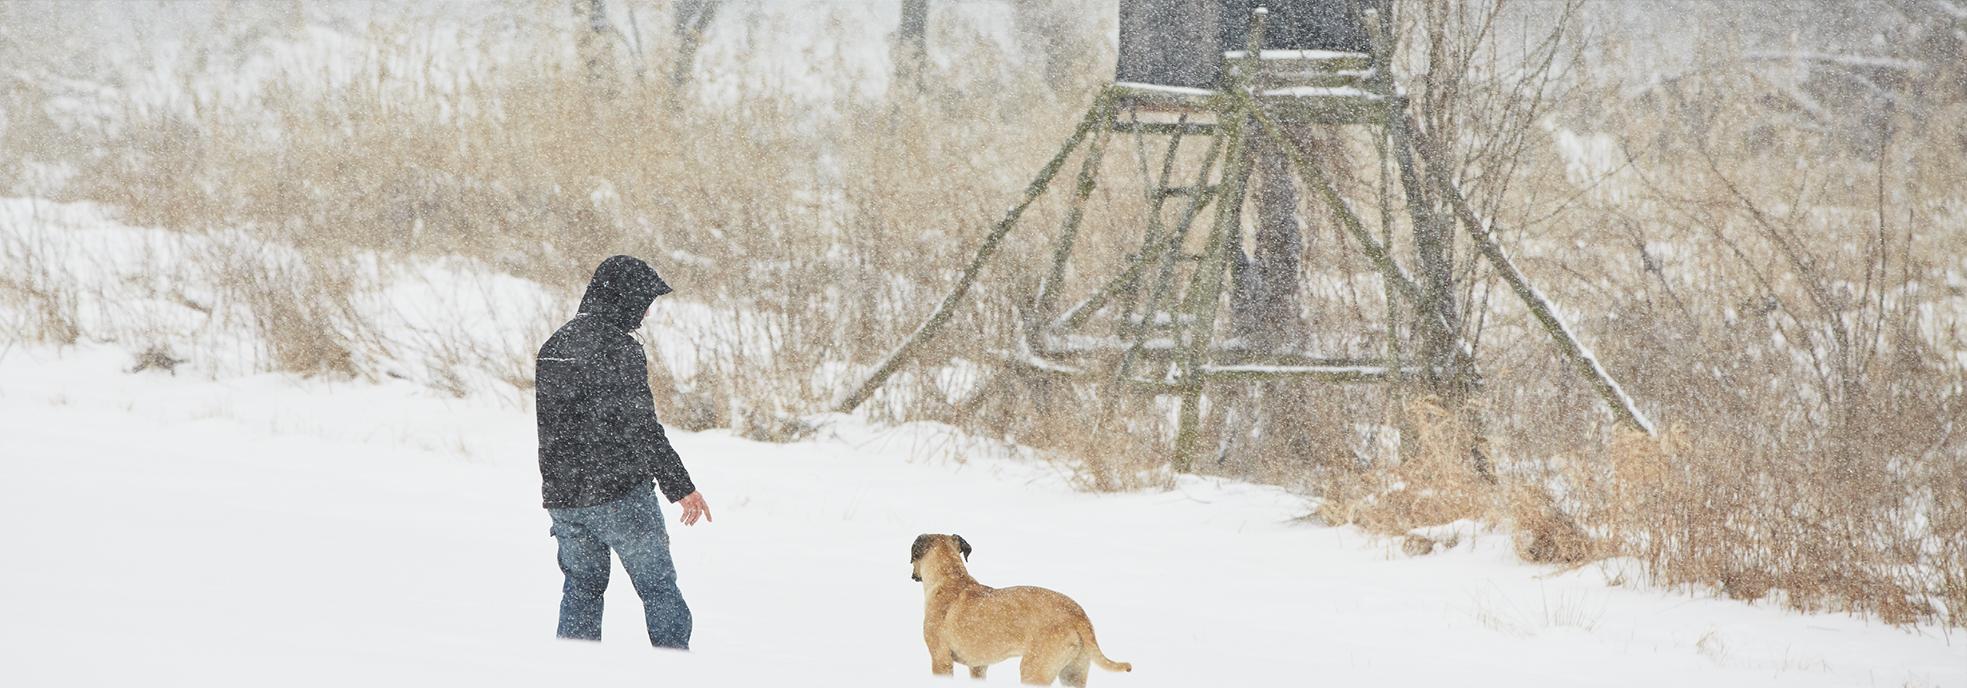 http://www.inderamills.com/wp-content/uploads/2014/08/snow-blind.jpg